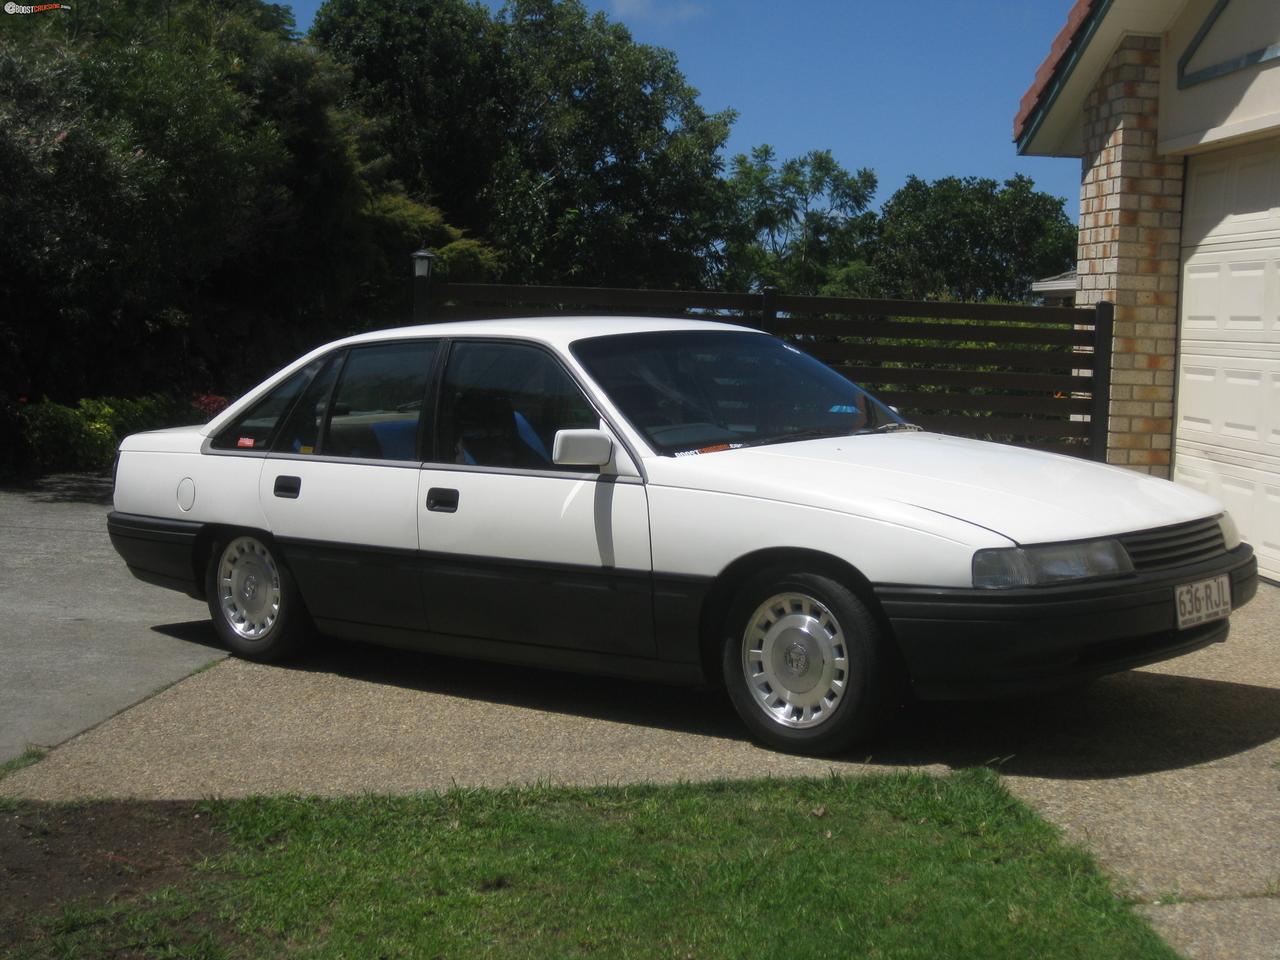 1991 Holden Commodore Vn - BoostCruising